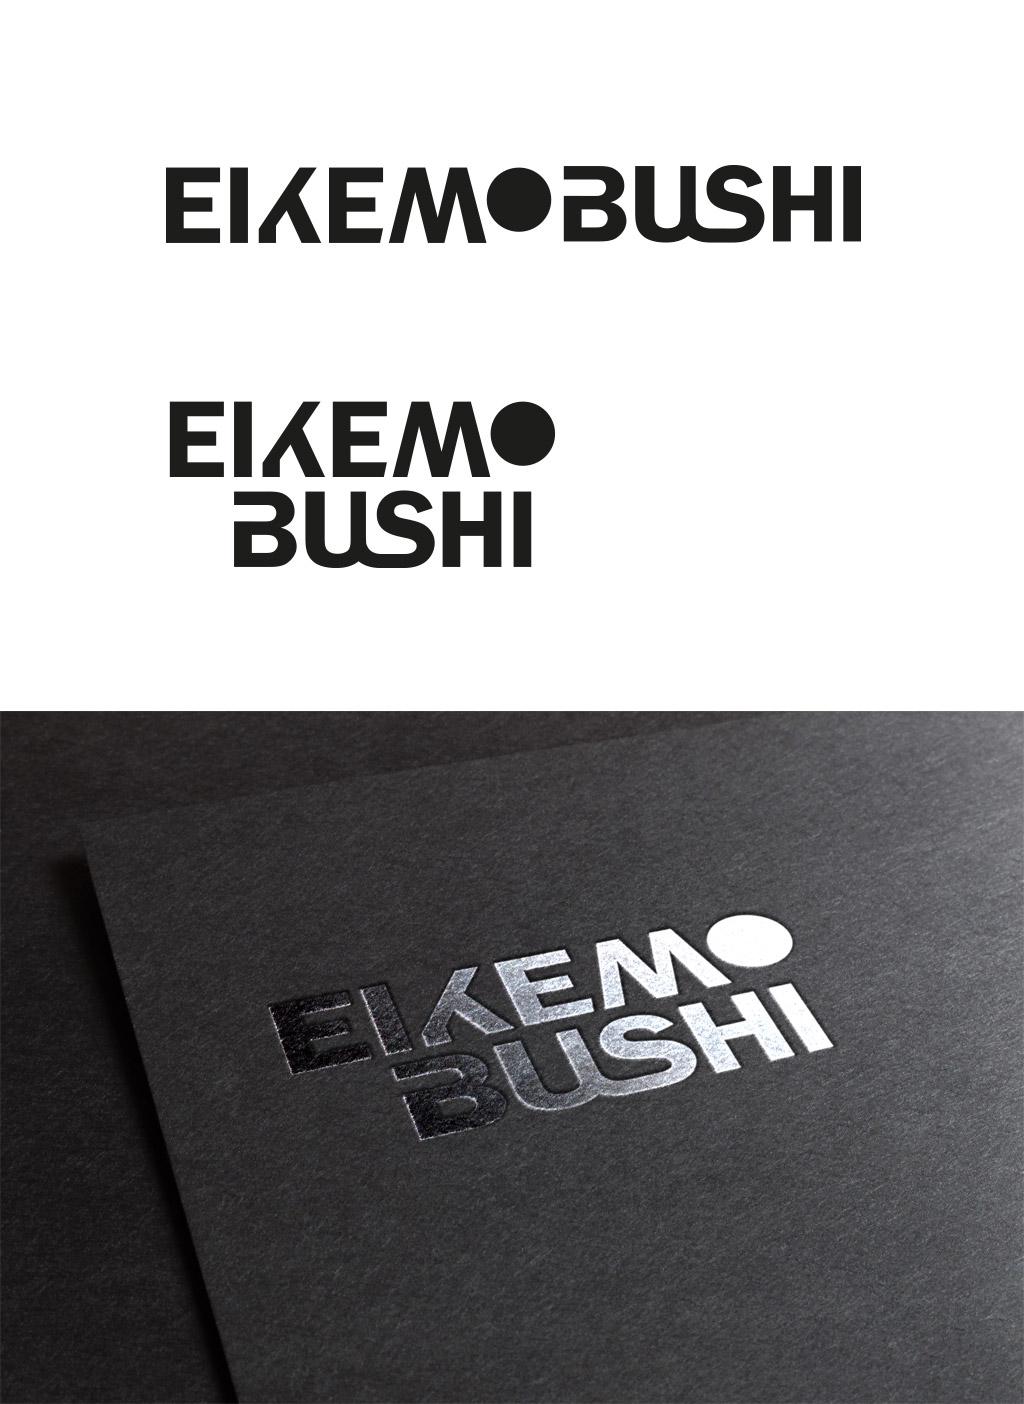 eikemobushi-logo-01